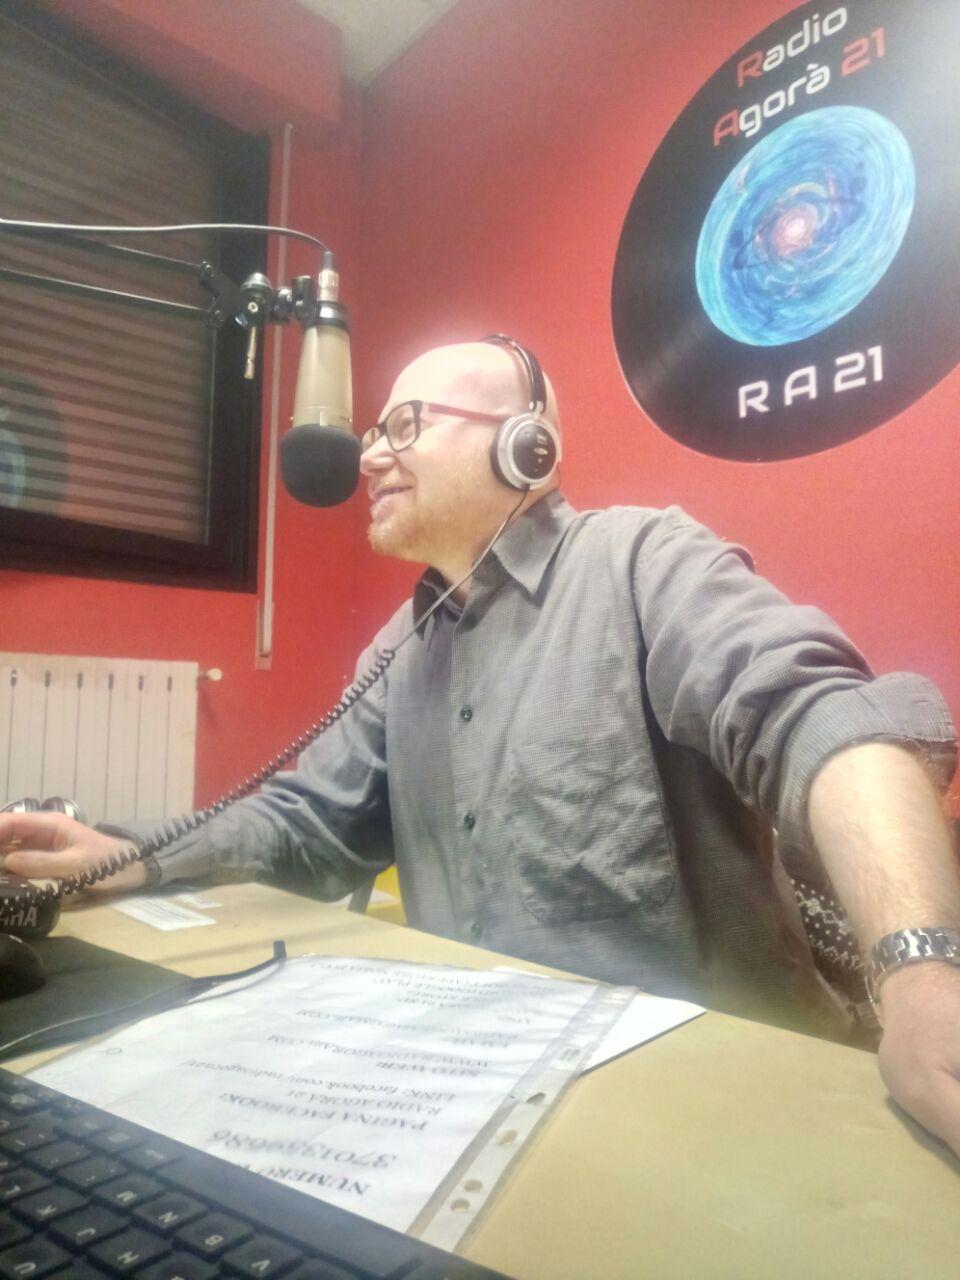 valenti-speaker-radio-agorà-21